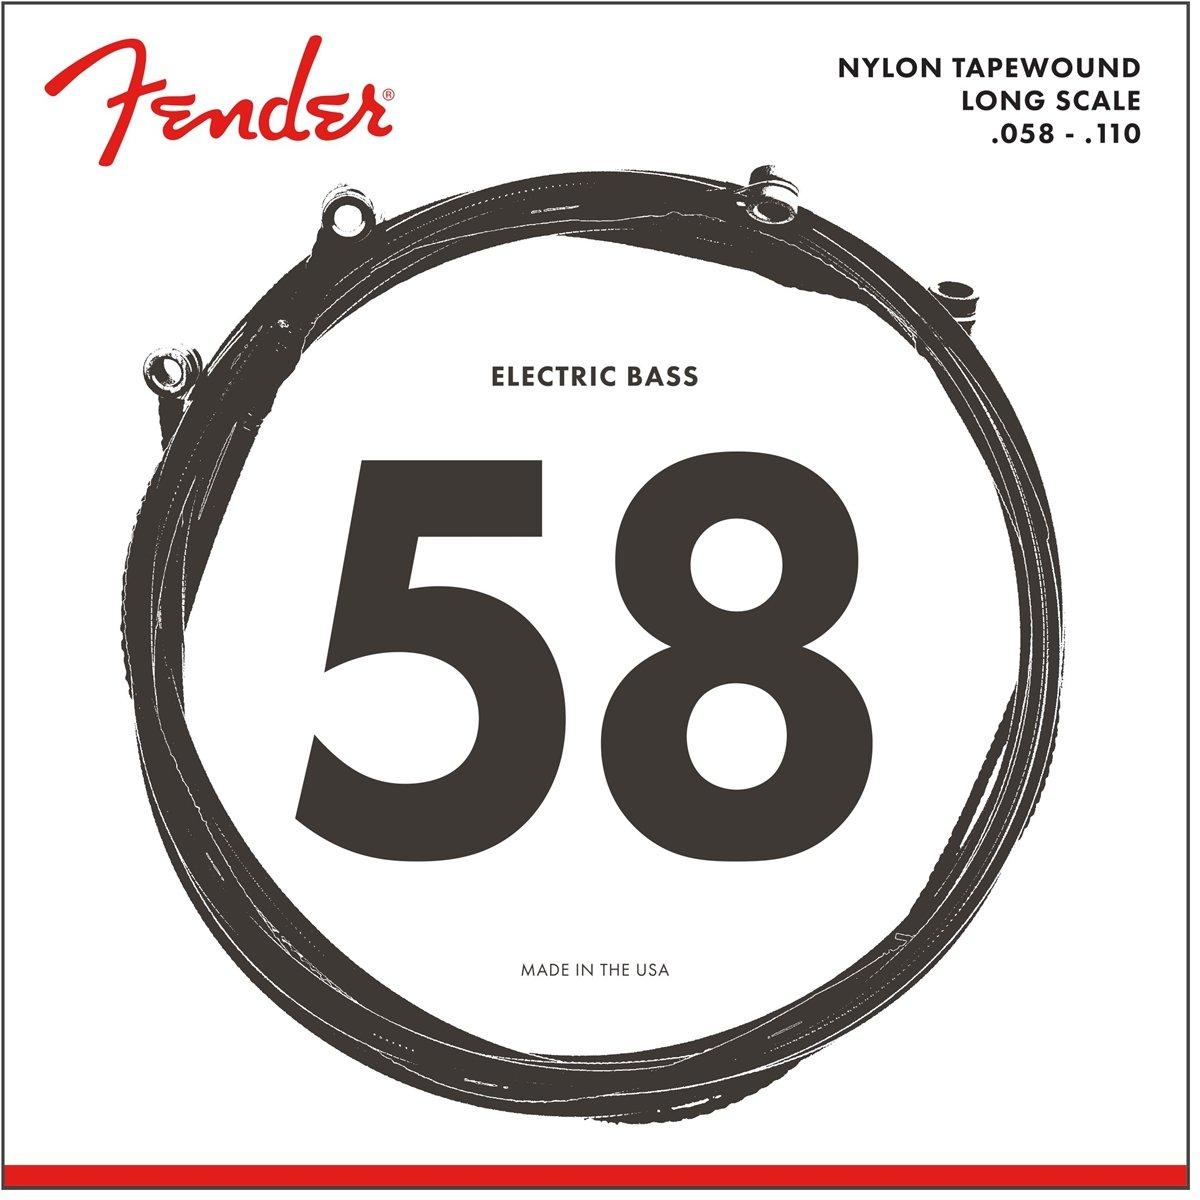 Fender Nylon Tape Wound Electric Bass Strings, 9120M - Medium (58 - 110)